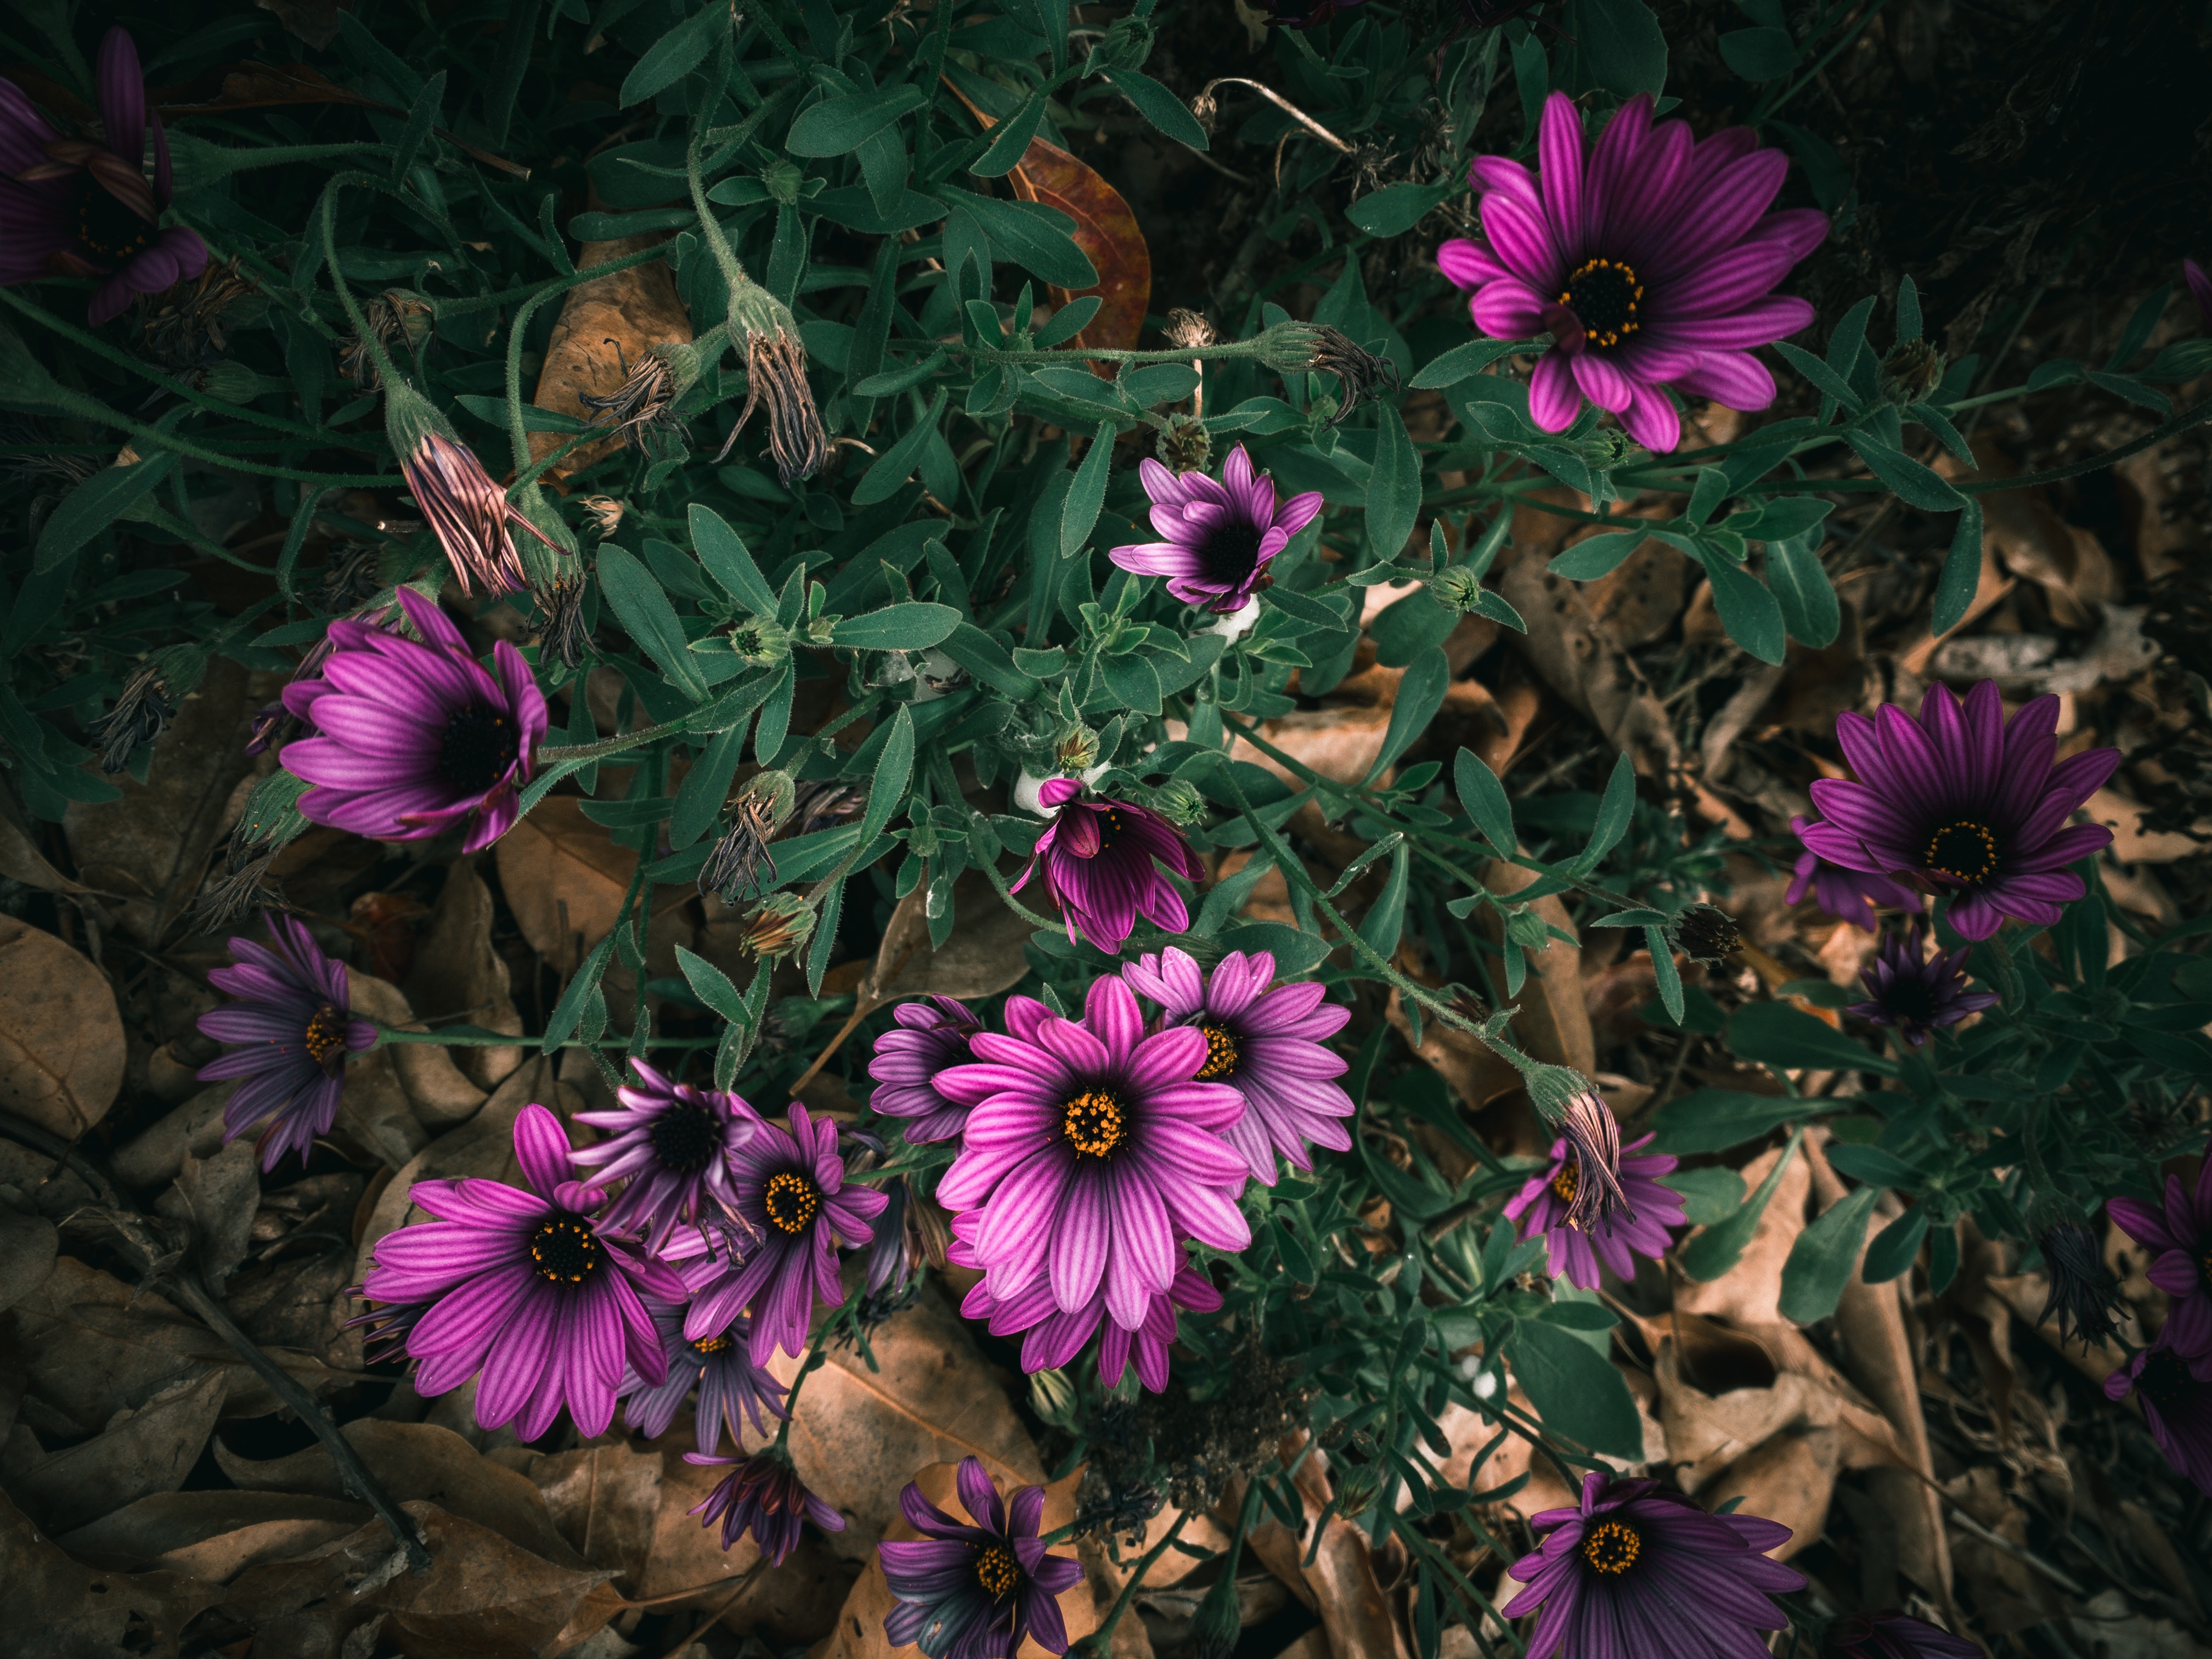 moody image of flowers